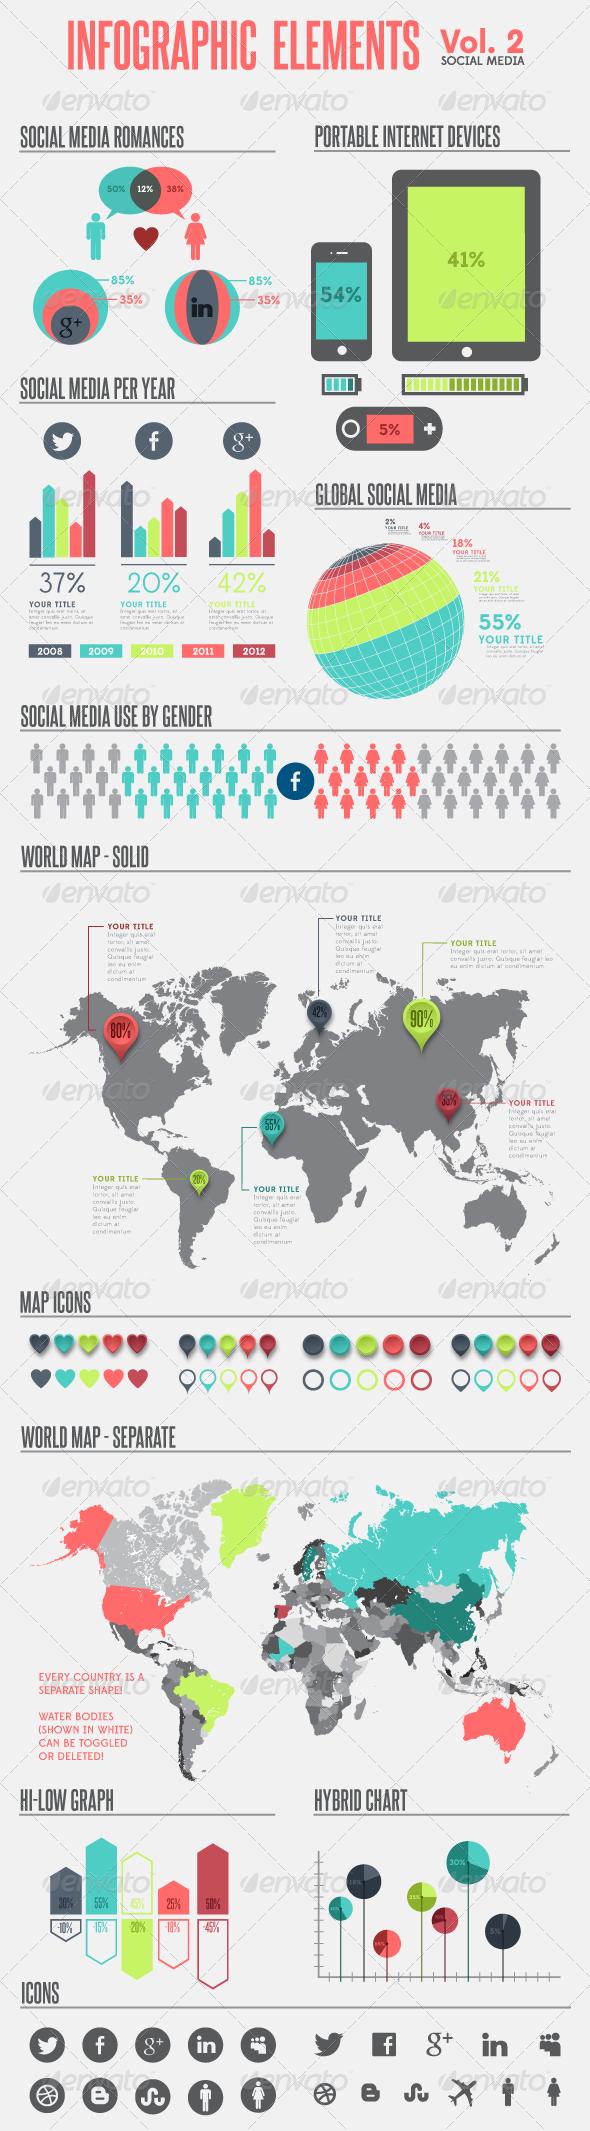 GraphicRiver Infographic Elements Vol 2 3079731